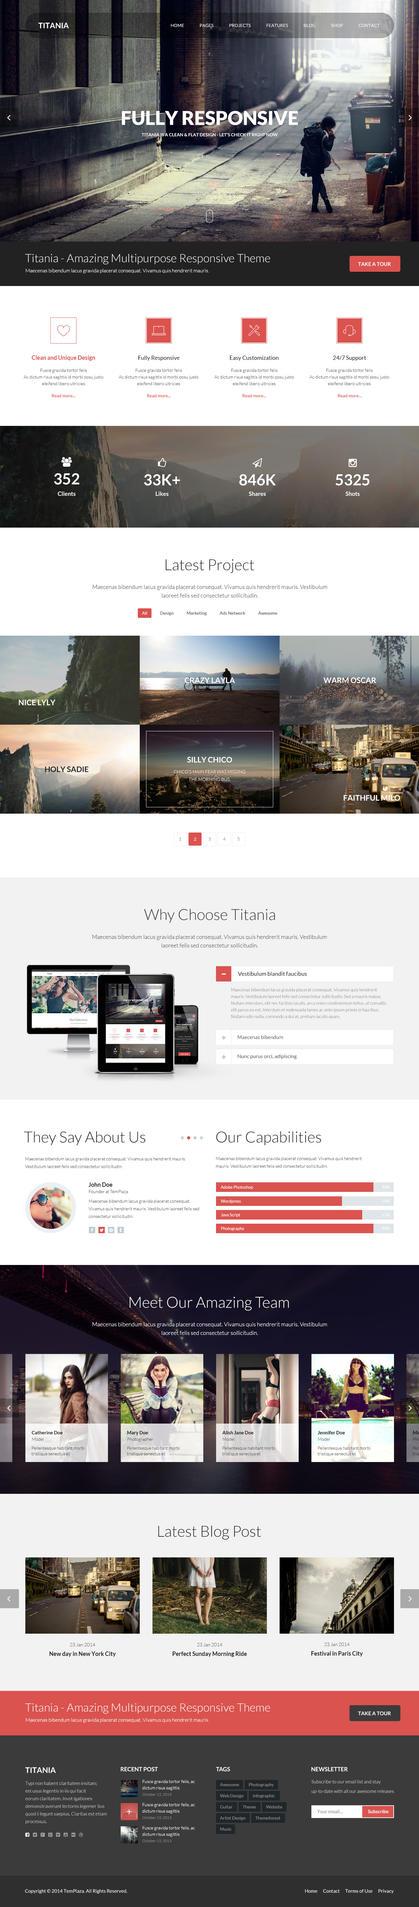 Titania - Multipurpose Theme. by templaza